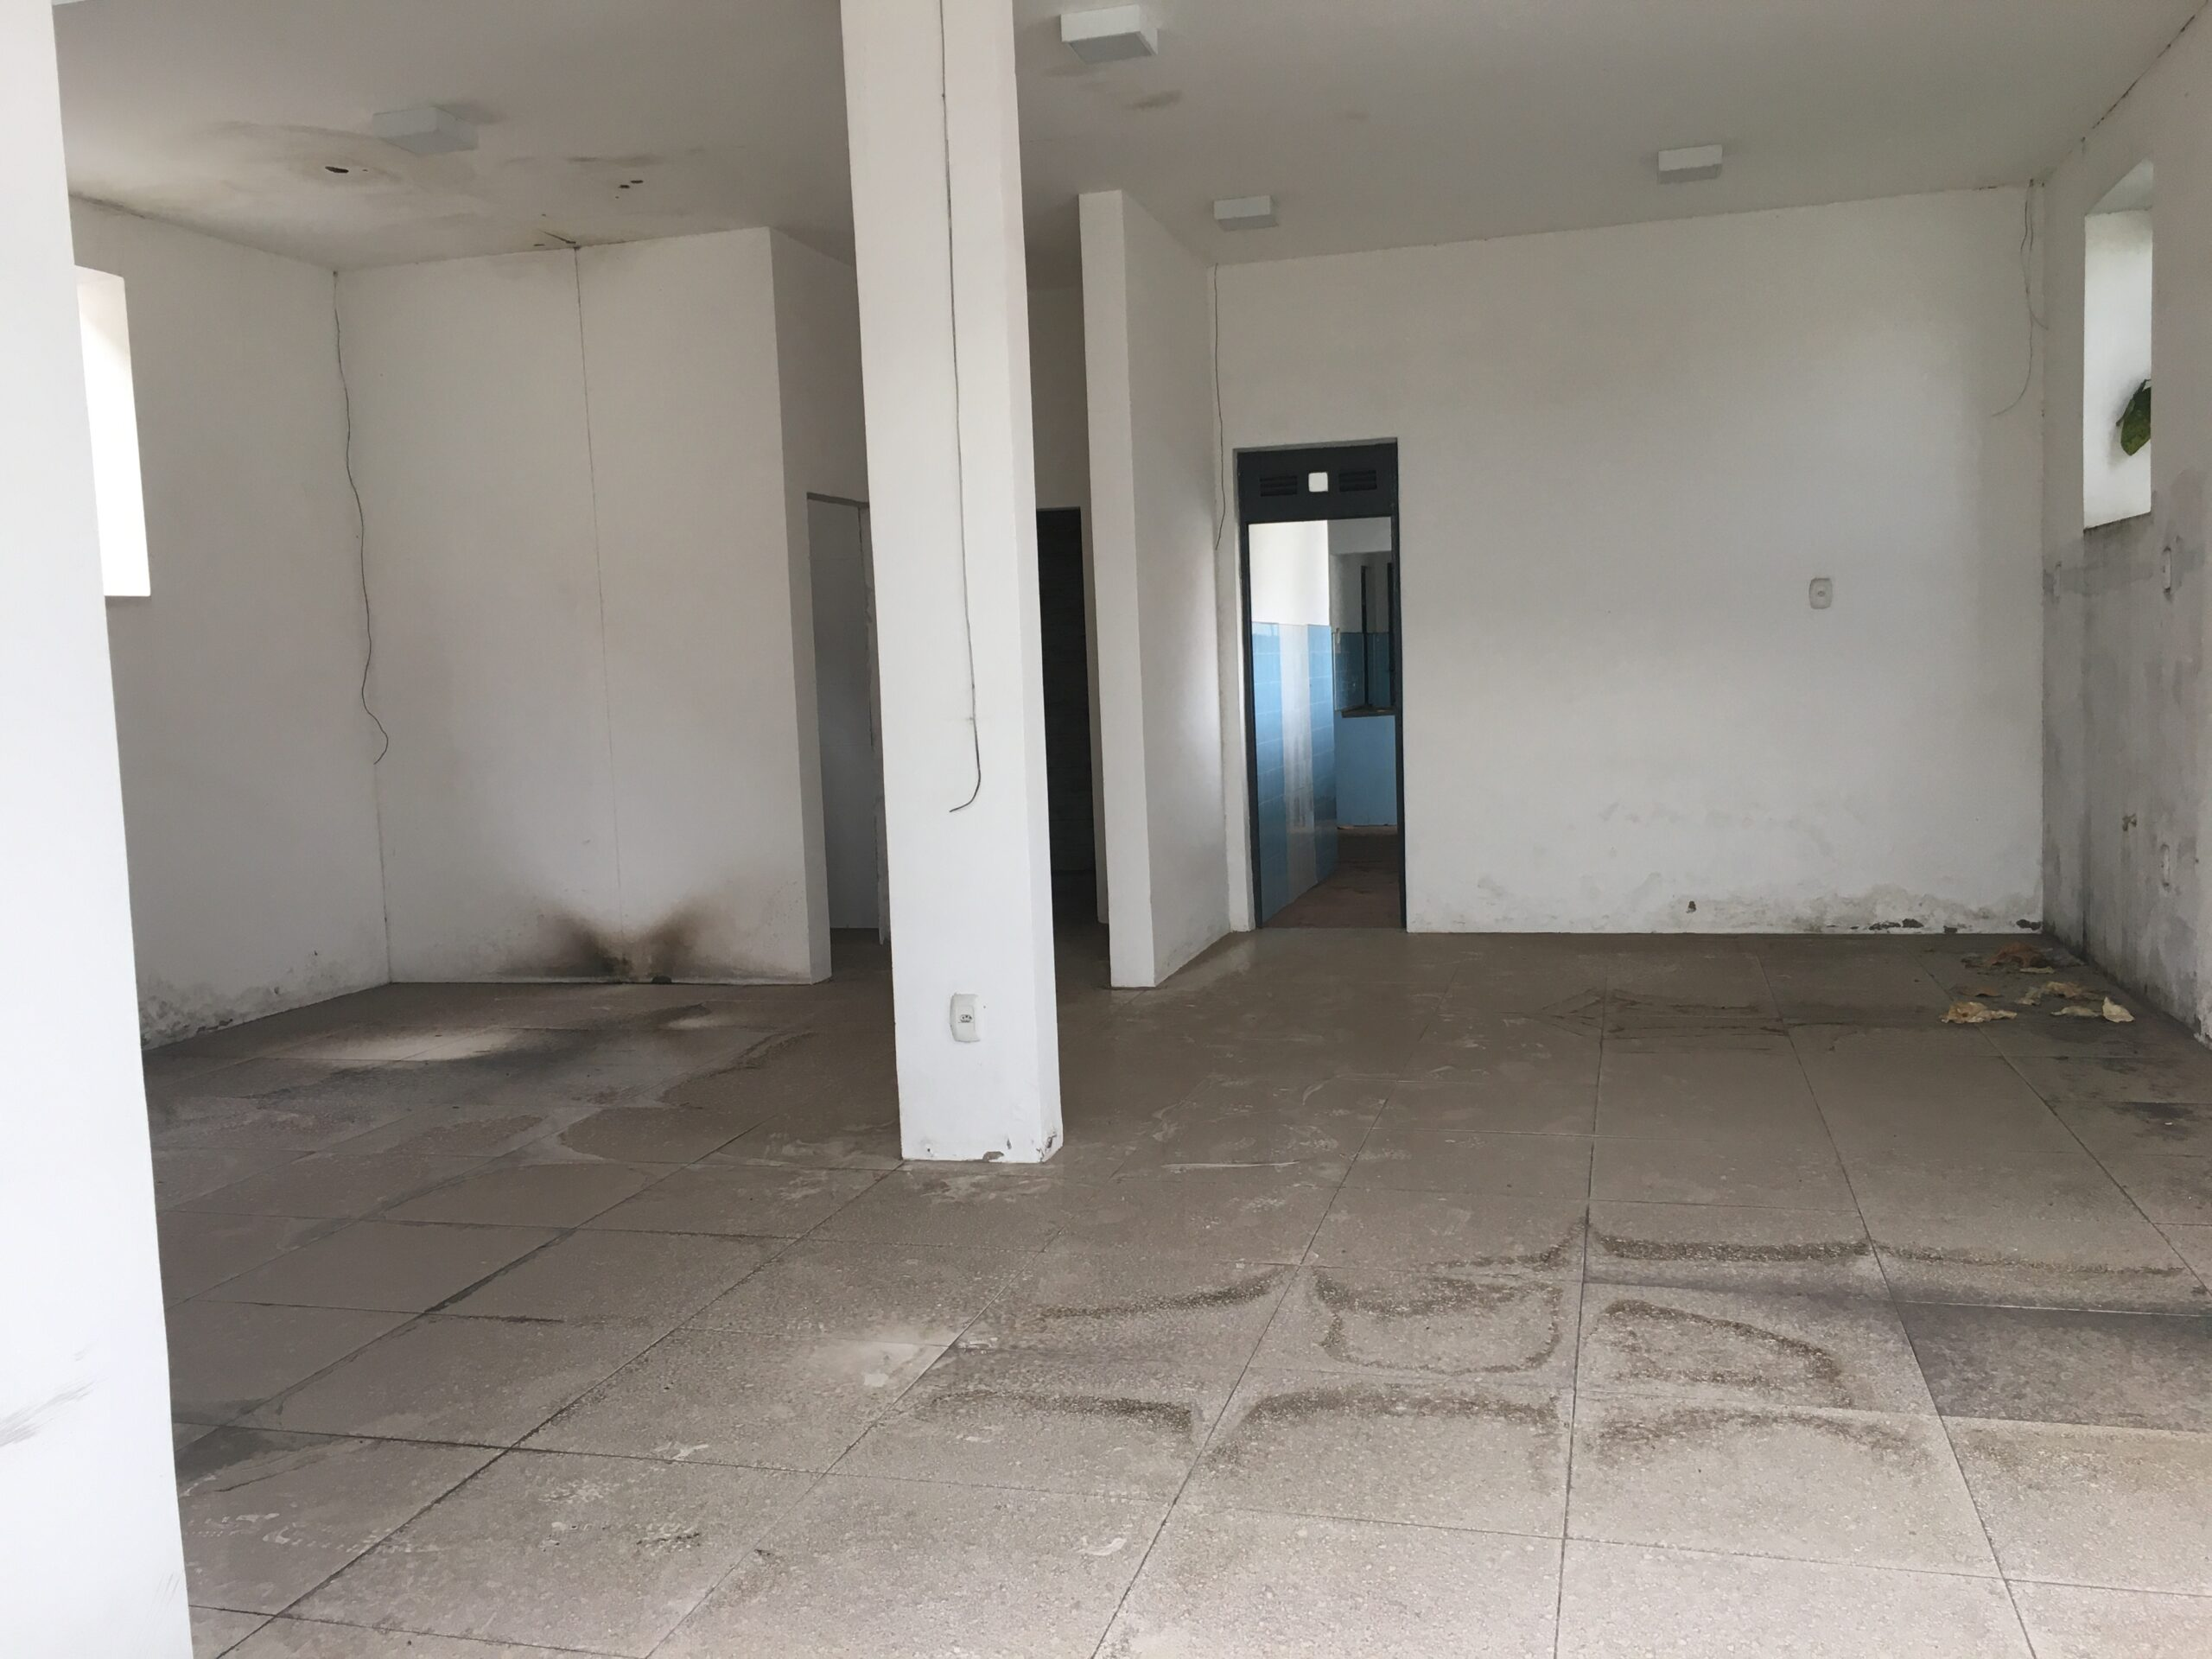 2 Casa 13x35 polo de saúde Teresina, próximo Palácio de Karnak, avenida Frei Serafim, piso em porcelanato